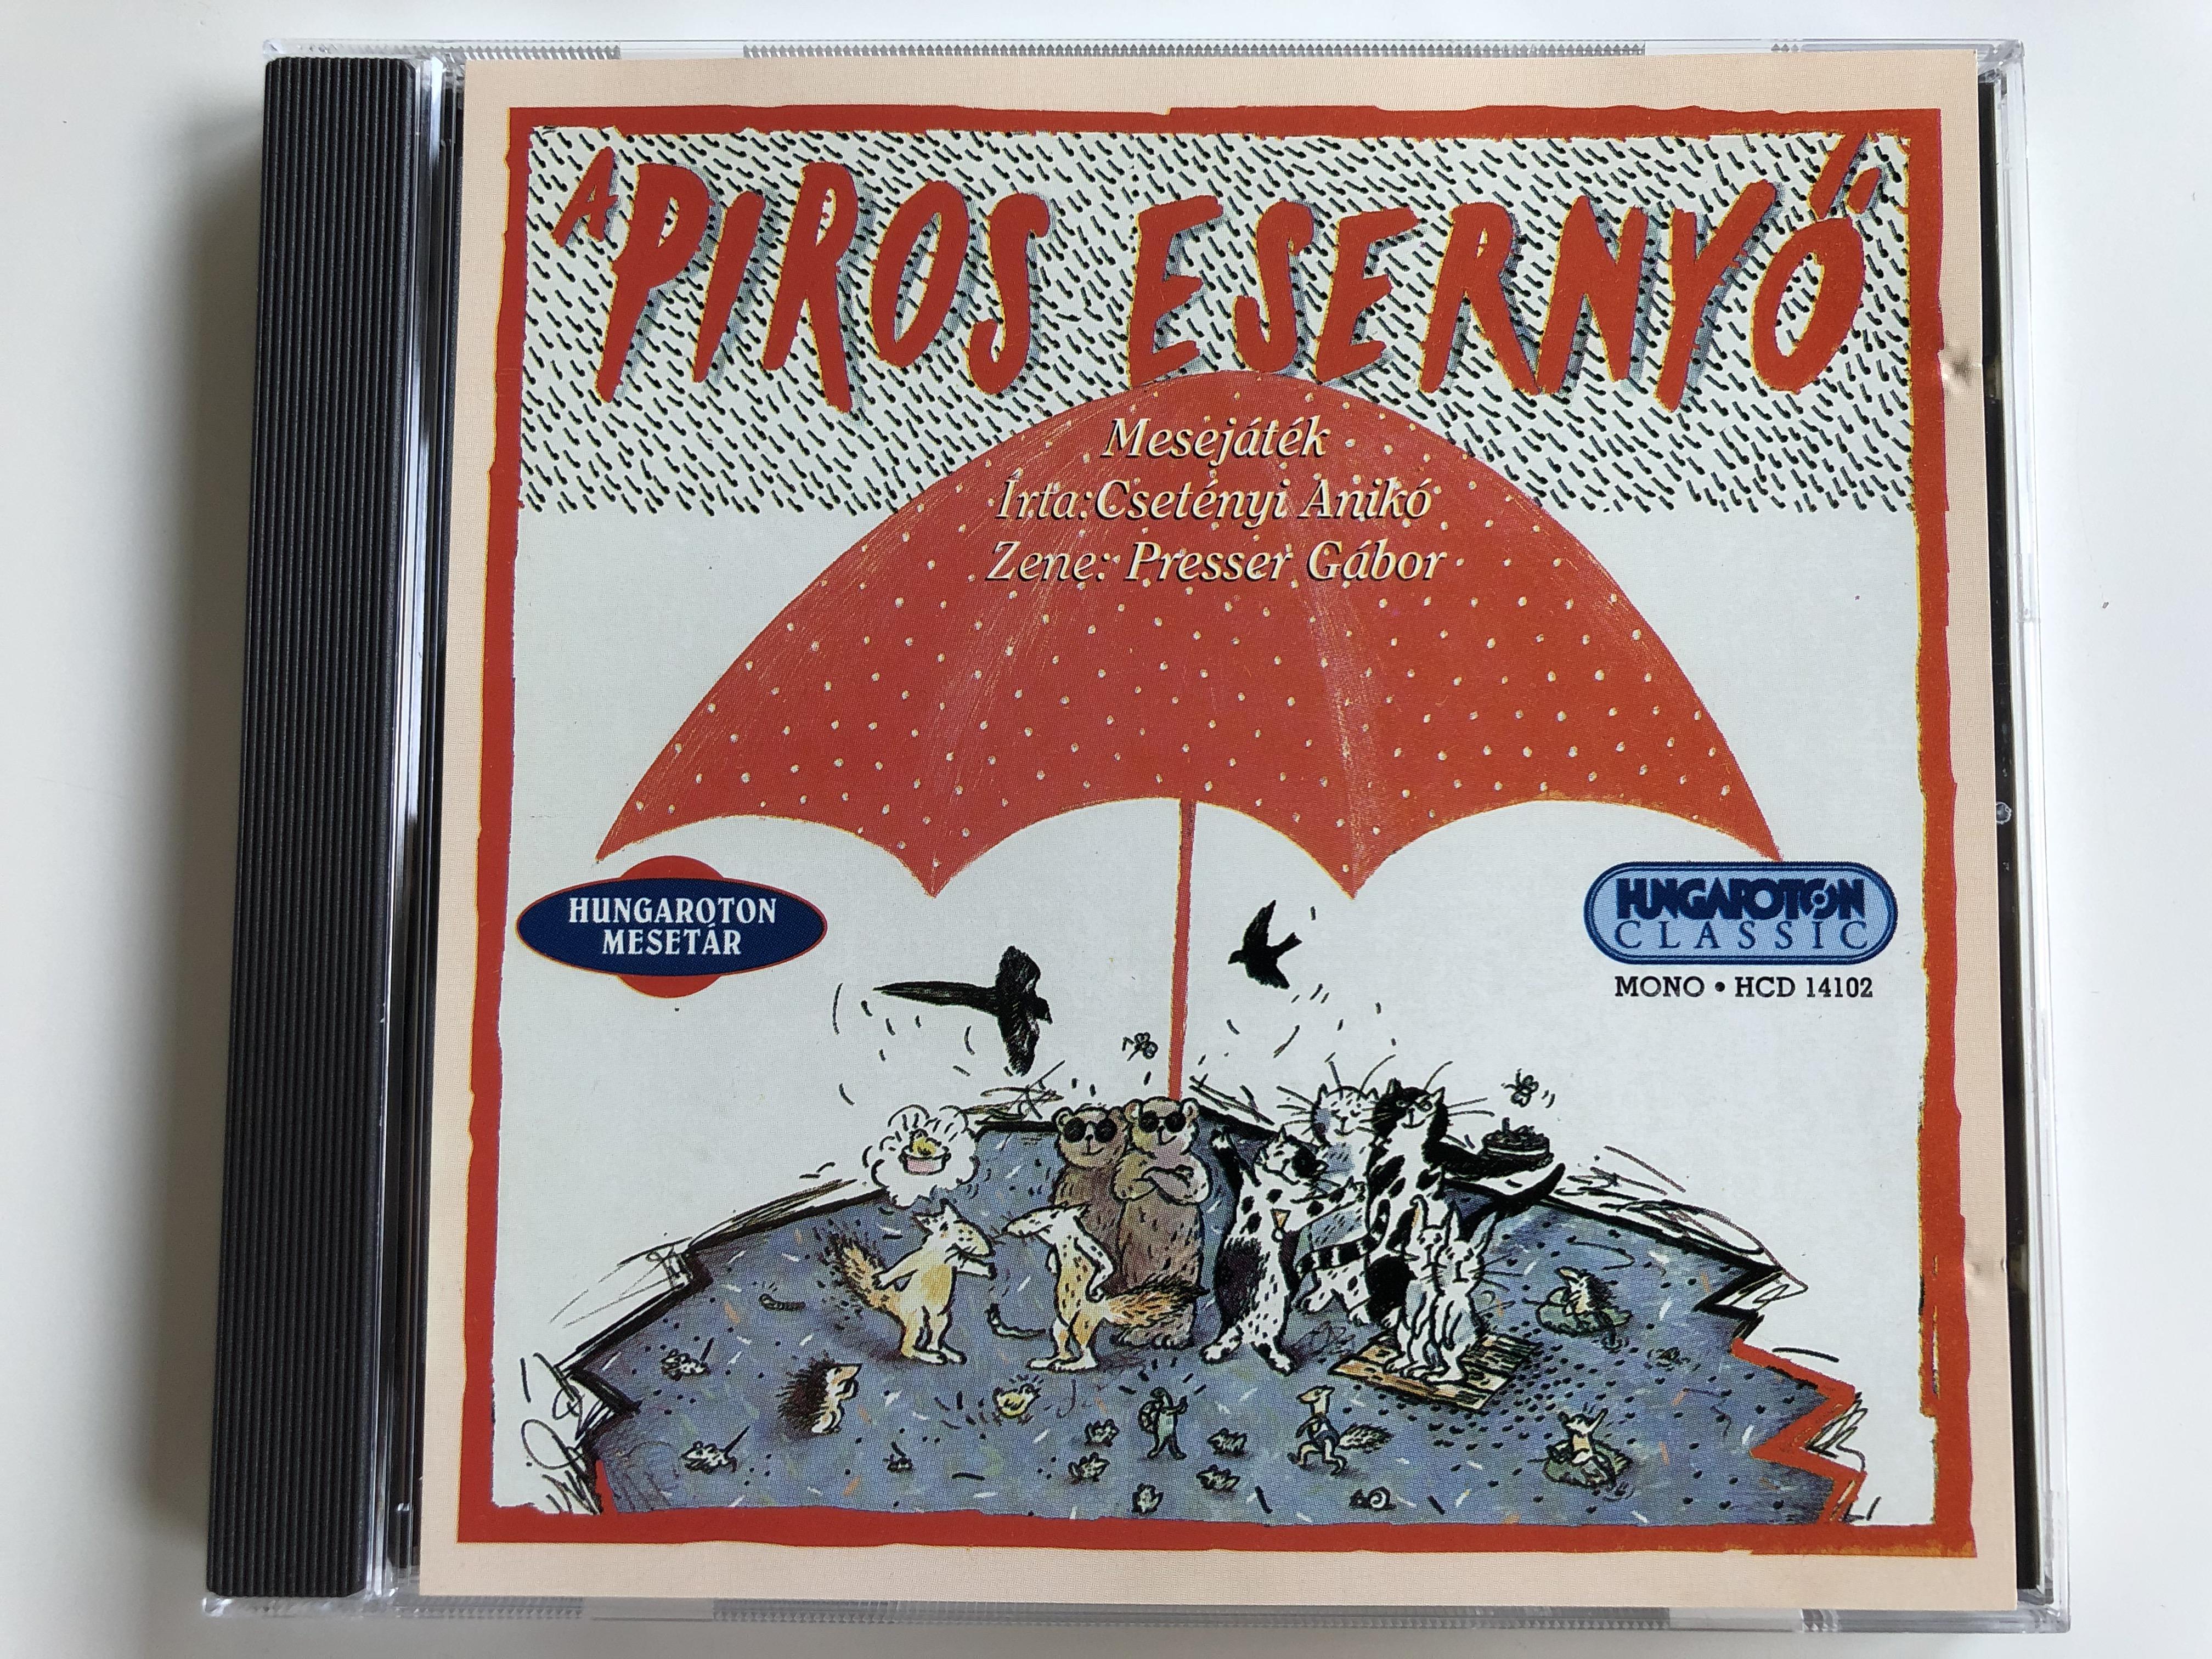 a-piros-eserny-mesejatek-irta-csetenyi-aniko-zene-presser-gabor-hungaroton-classic-audio-cd-1988-mono-hcd-14102-1-.jpg